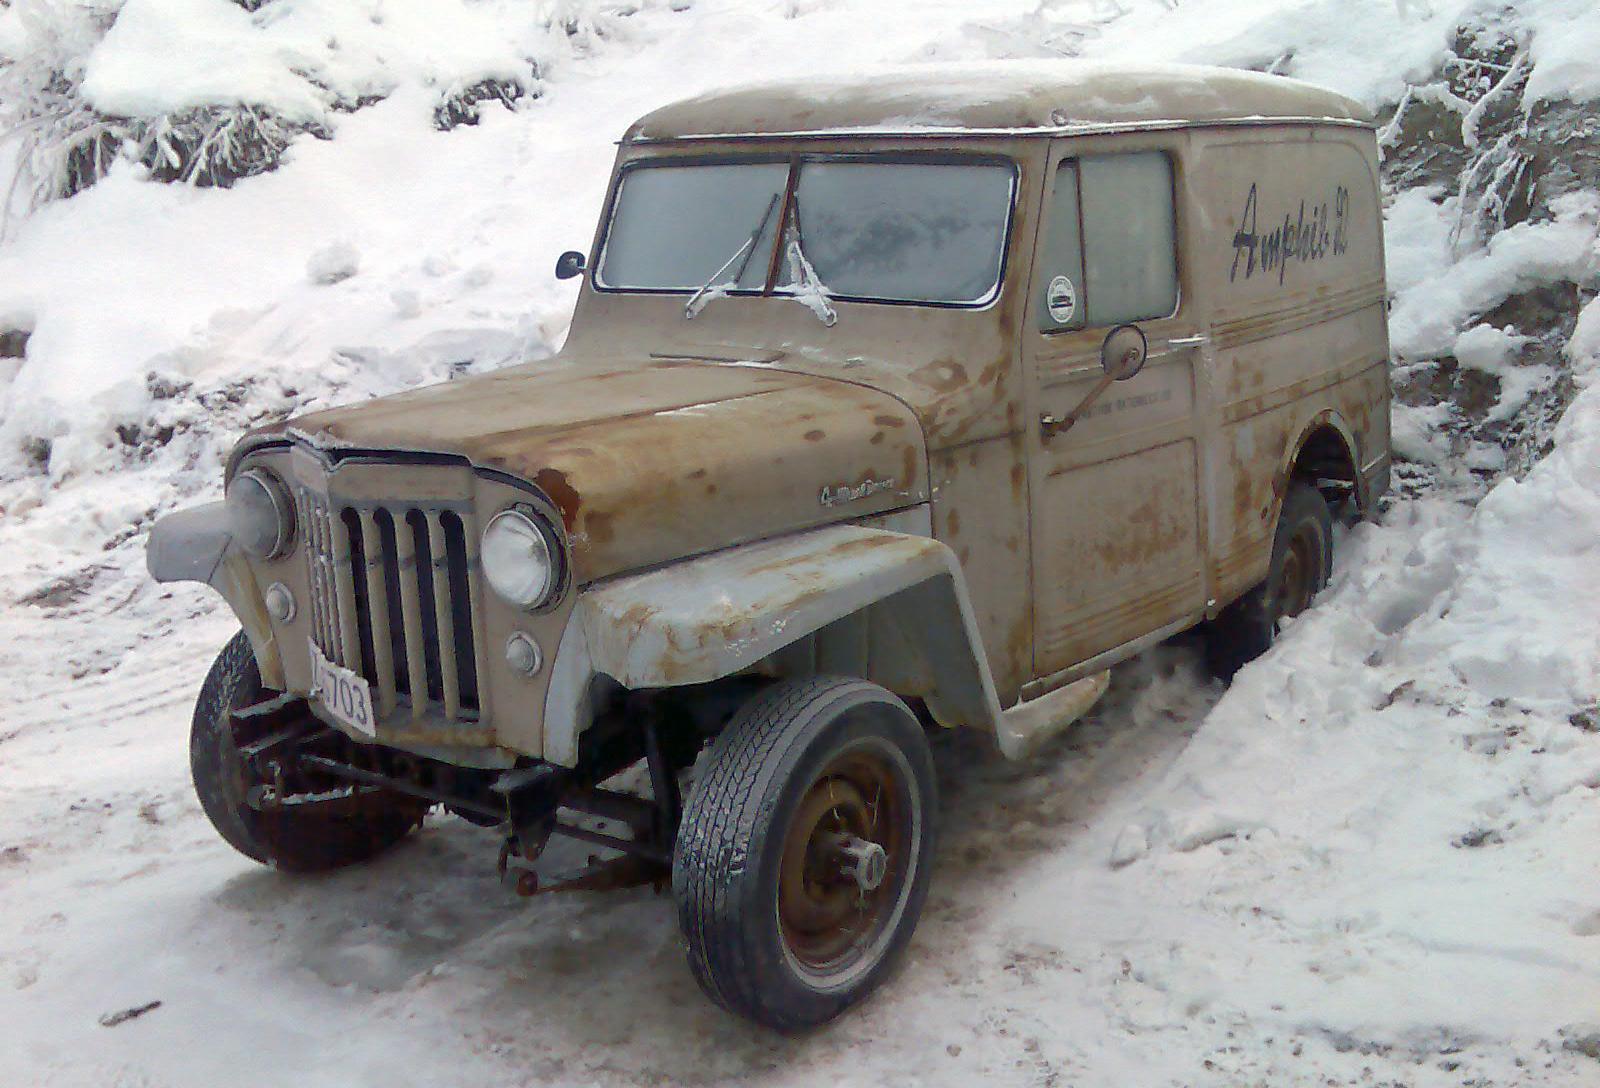 195-1956 Willys Delivery 01. Eier- medlem 195 Roge